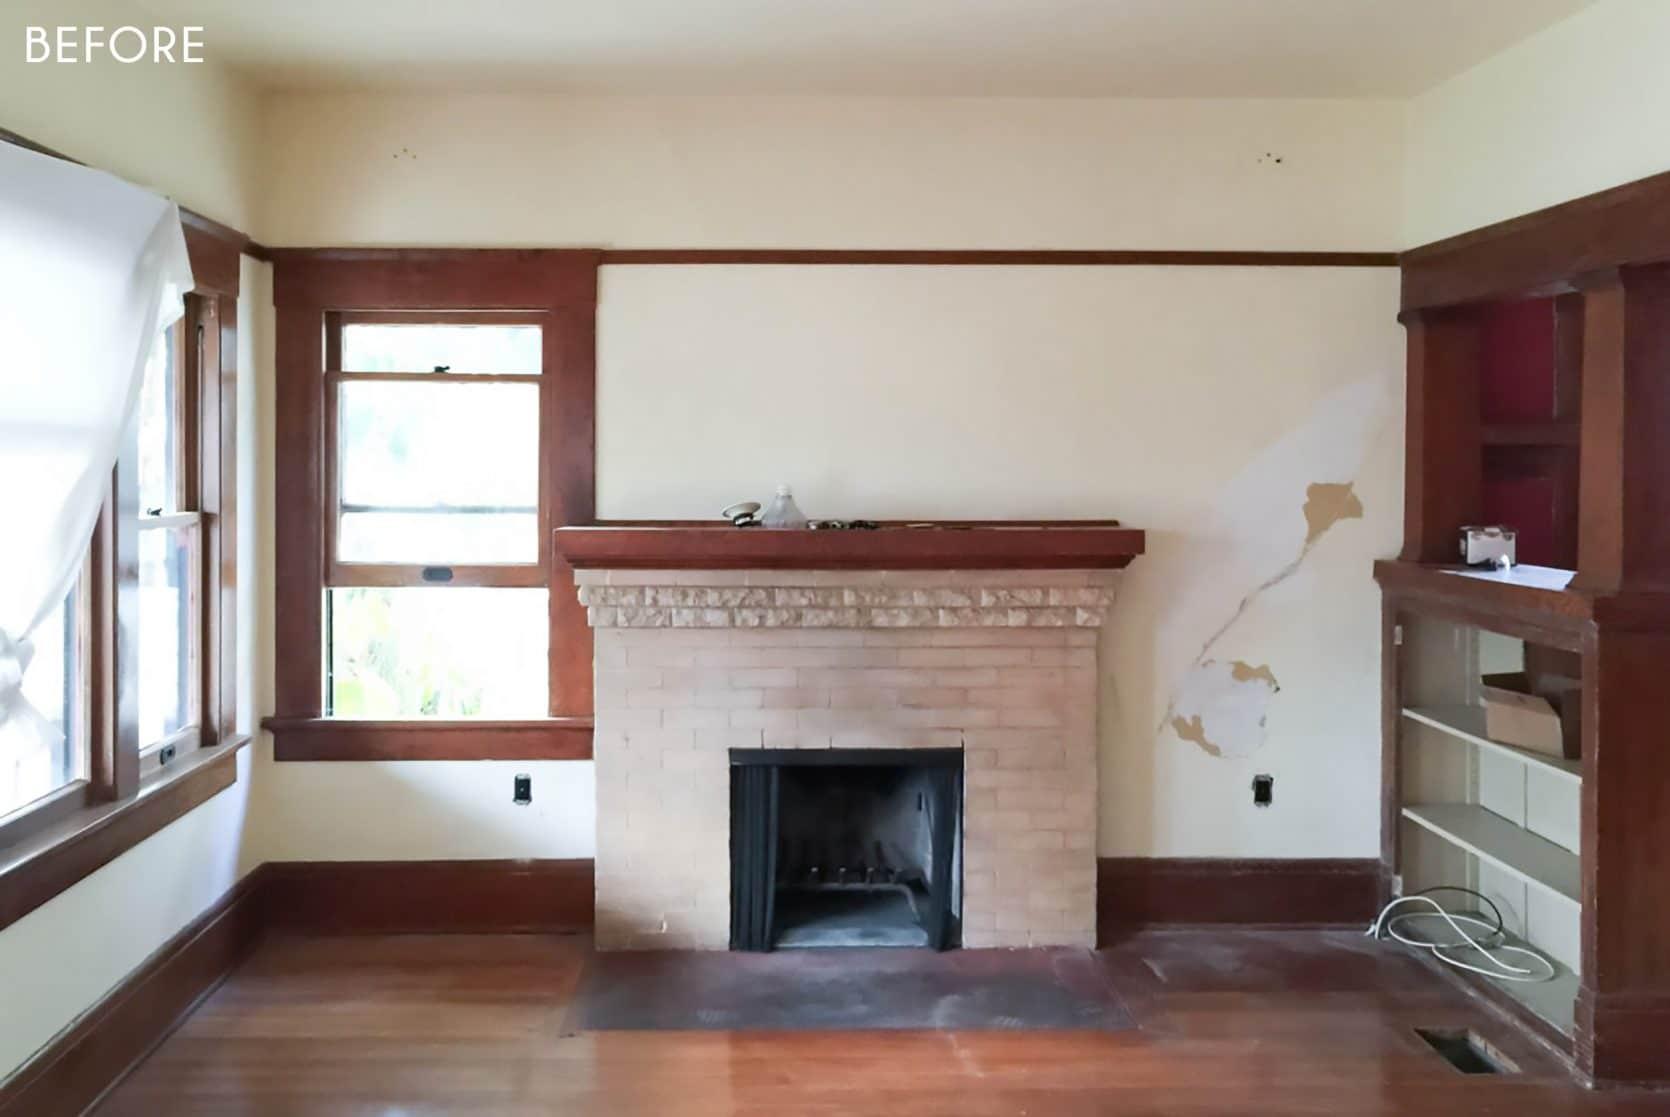 Livingroombefore 1